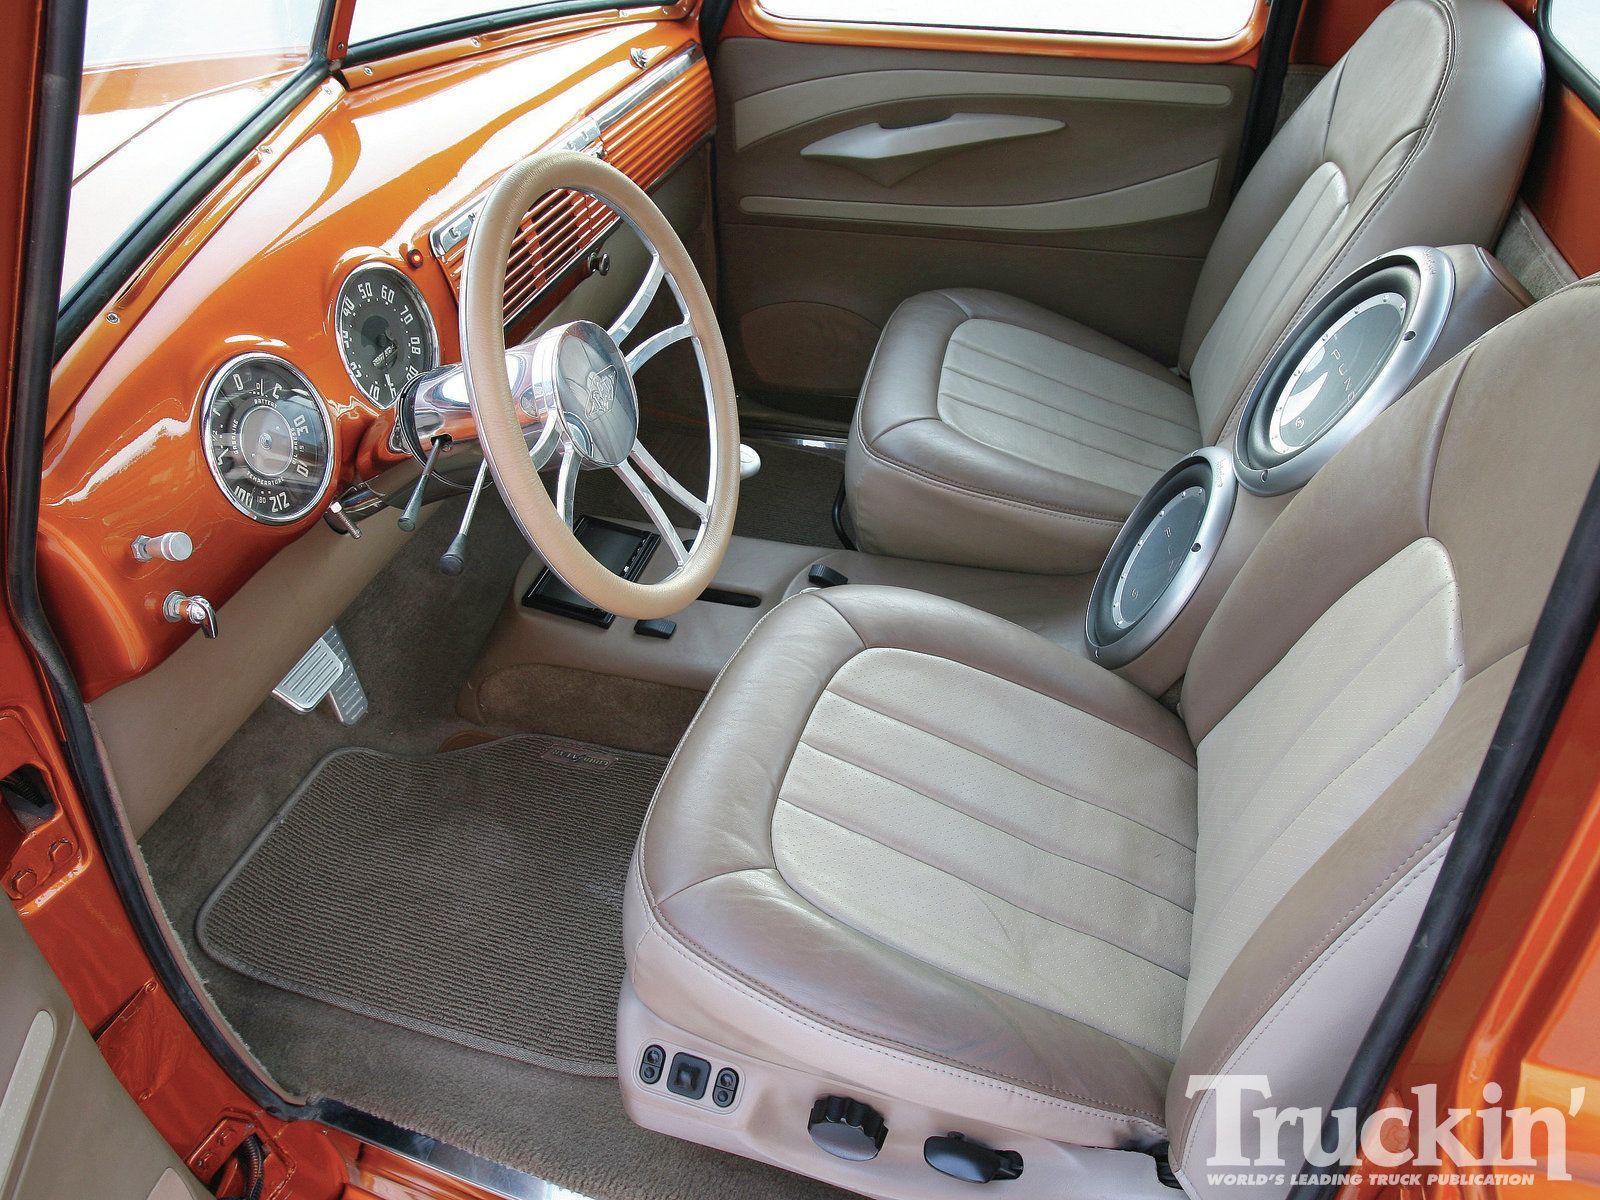 47 53 chevrolet 3100 steering wheel Google Search Cars